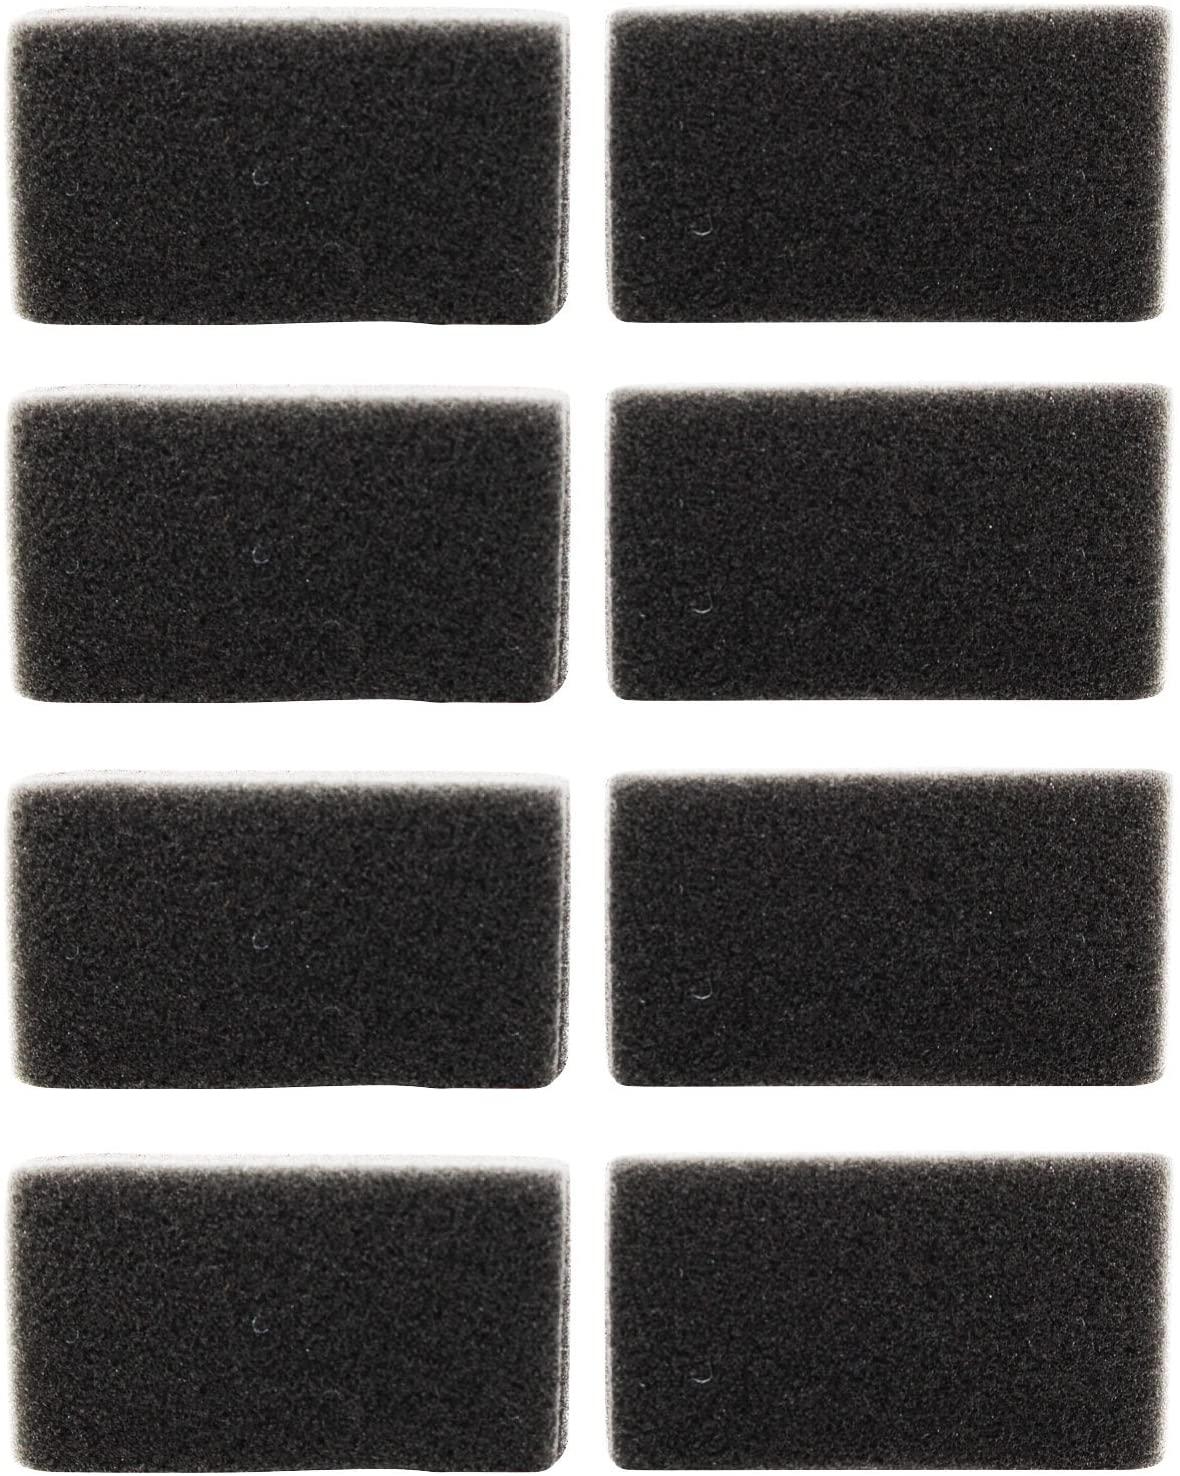 8 Replacement Reusable CPAP Foam Filters for M-Series BiPAP Plus